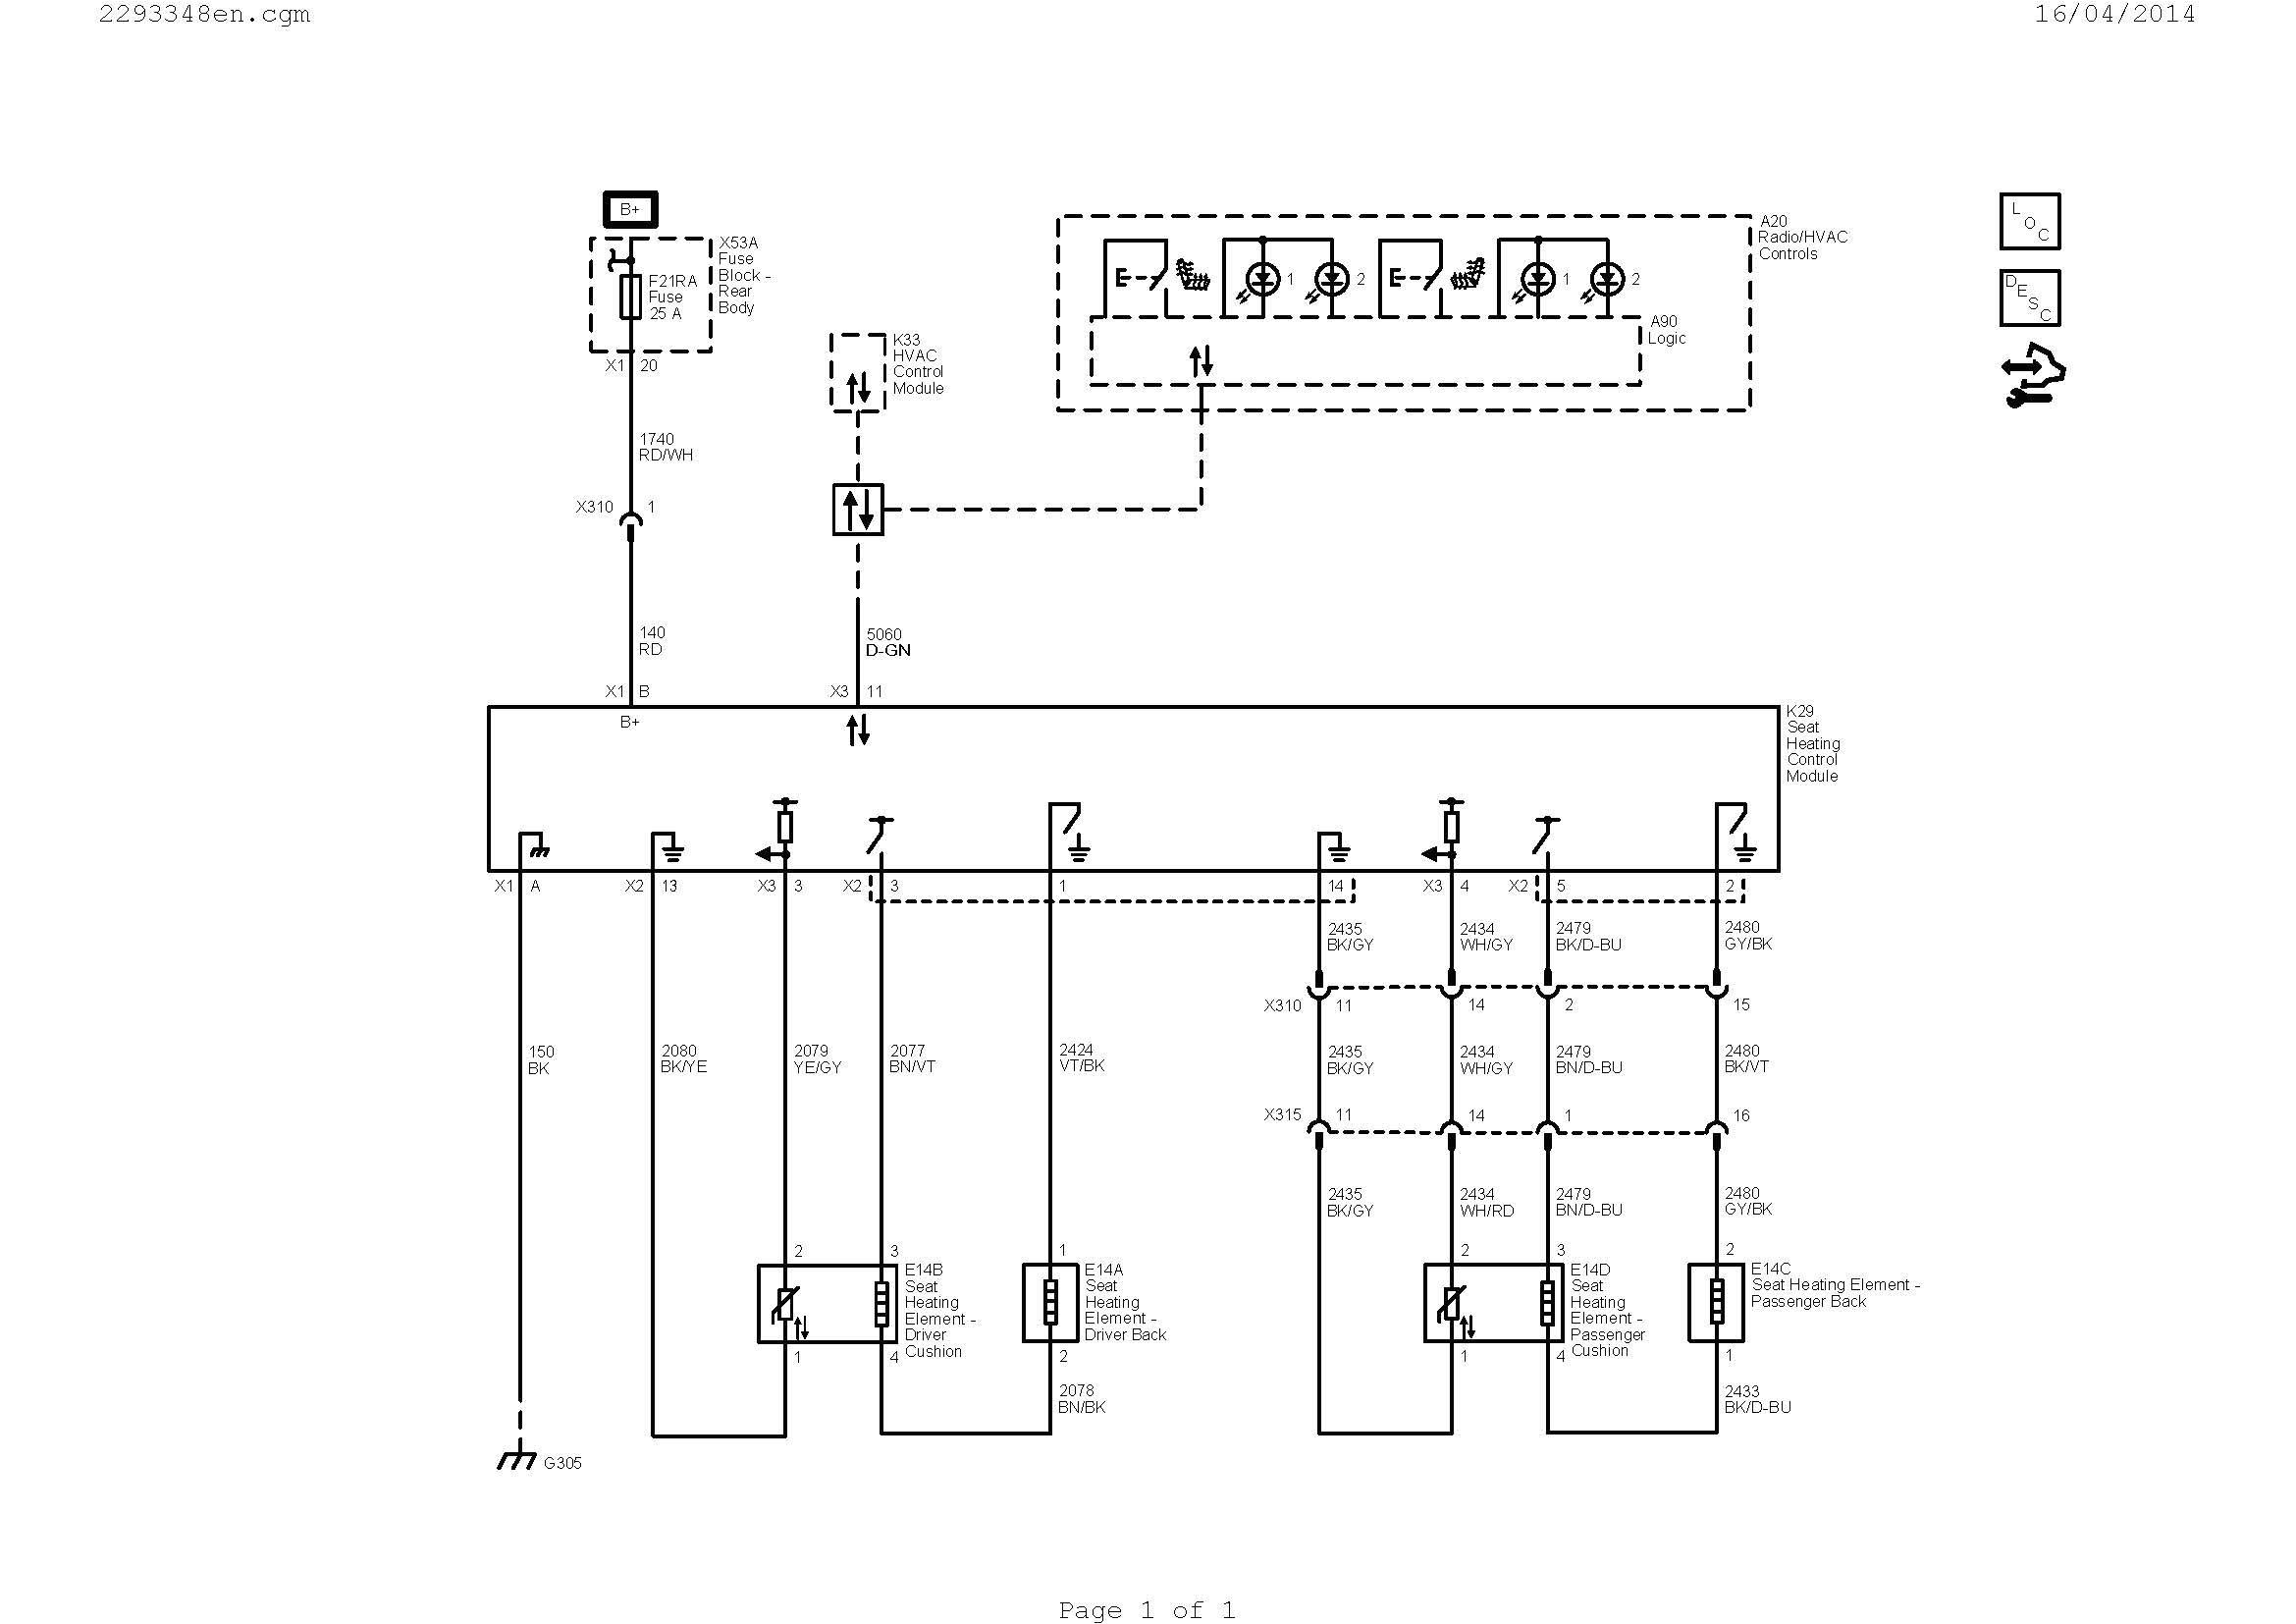 Plug In Wiring Diagram Electrical socket Wiring Diagram Wiring Library